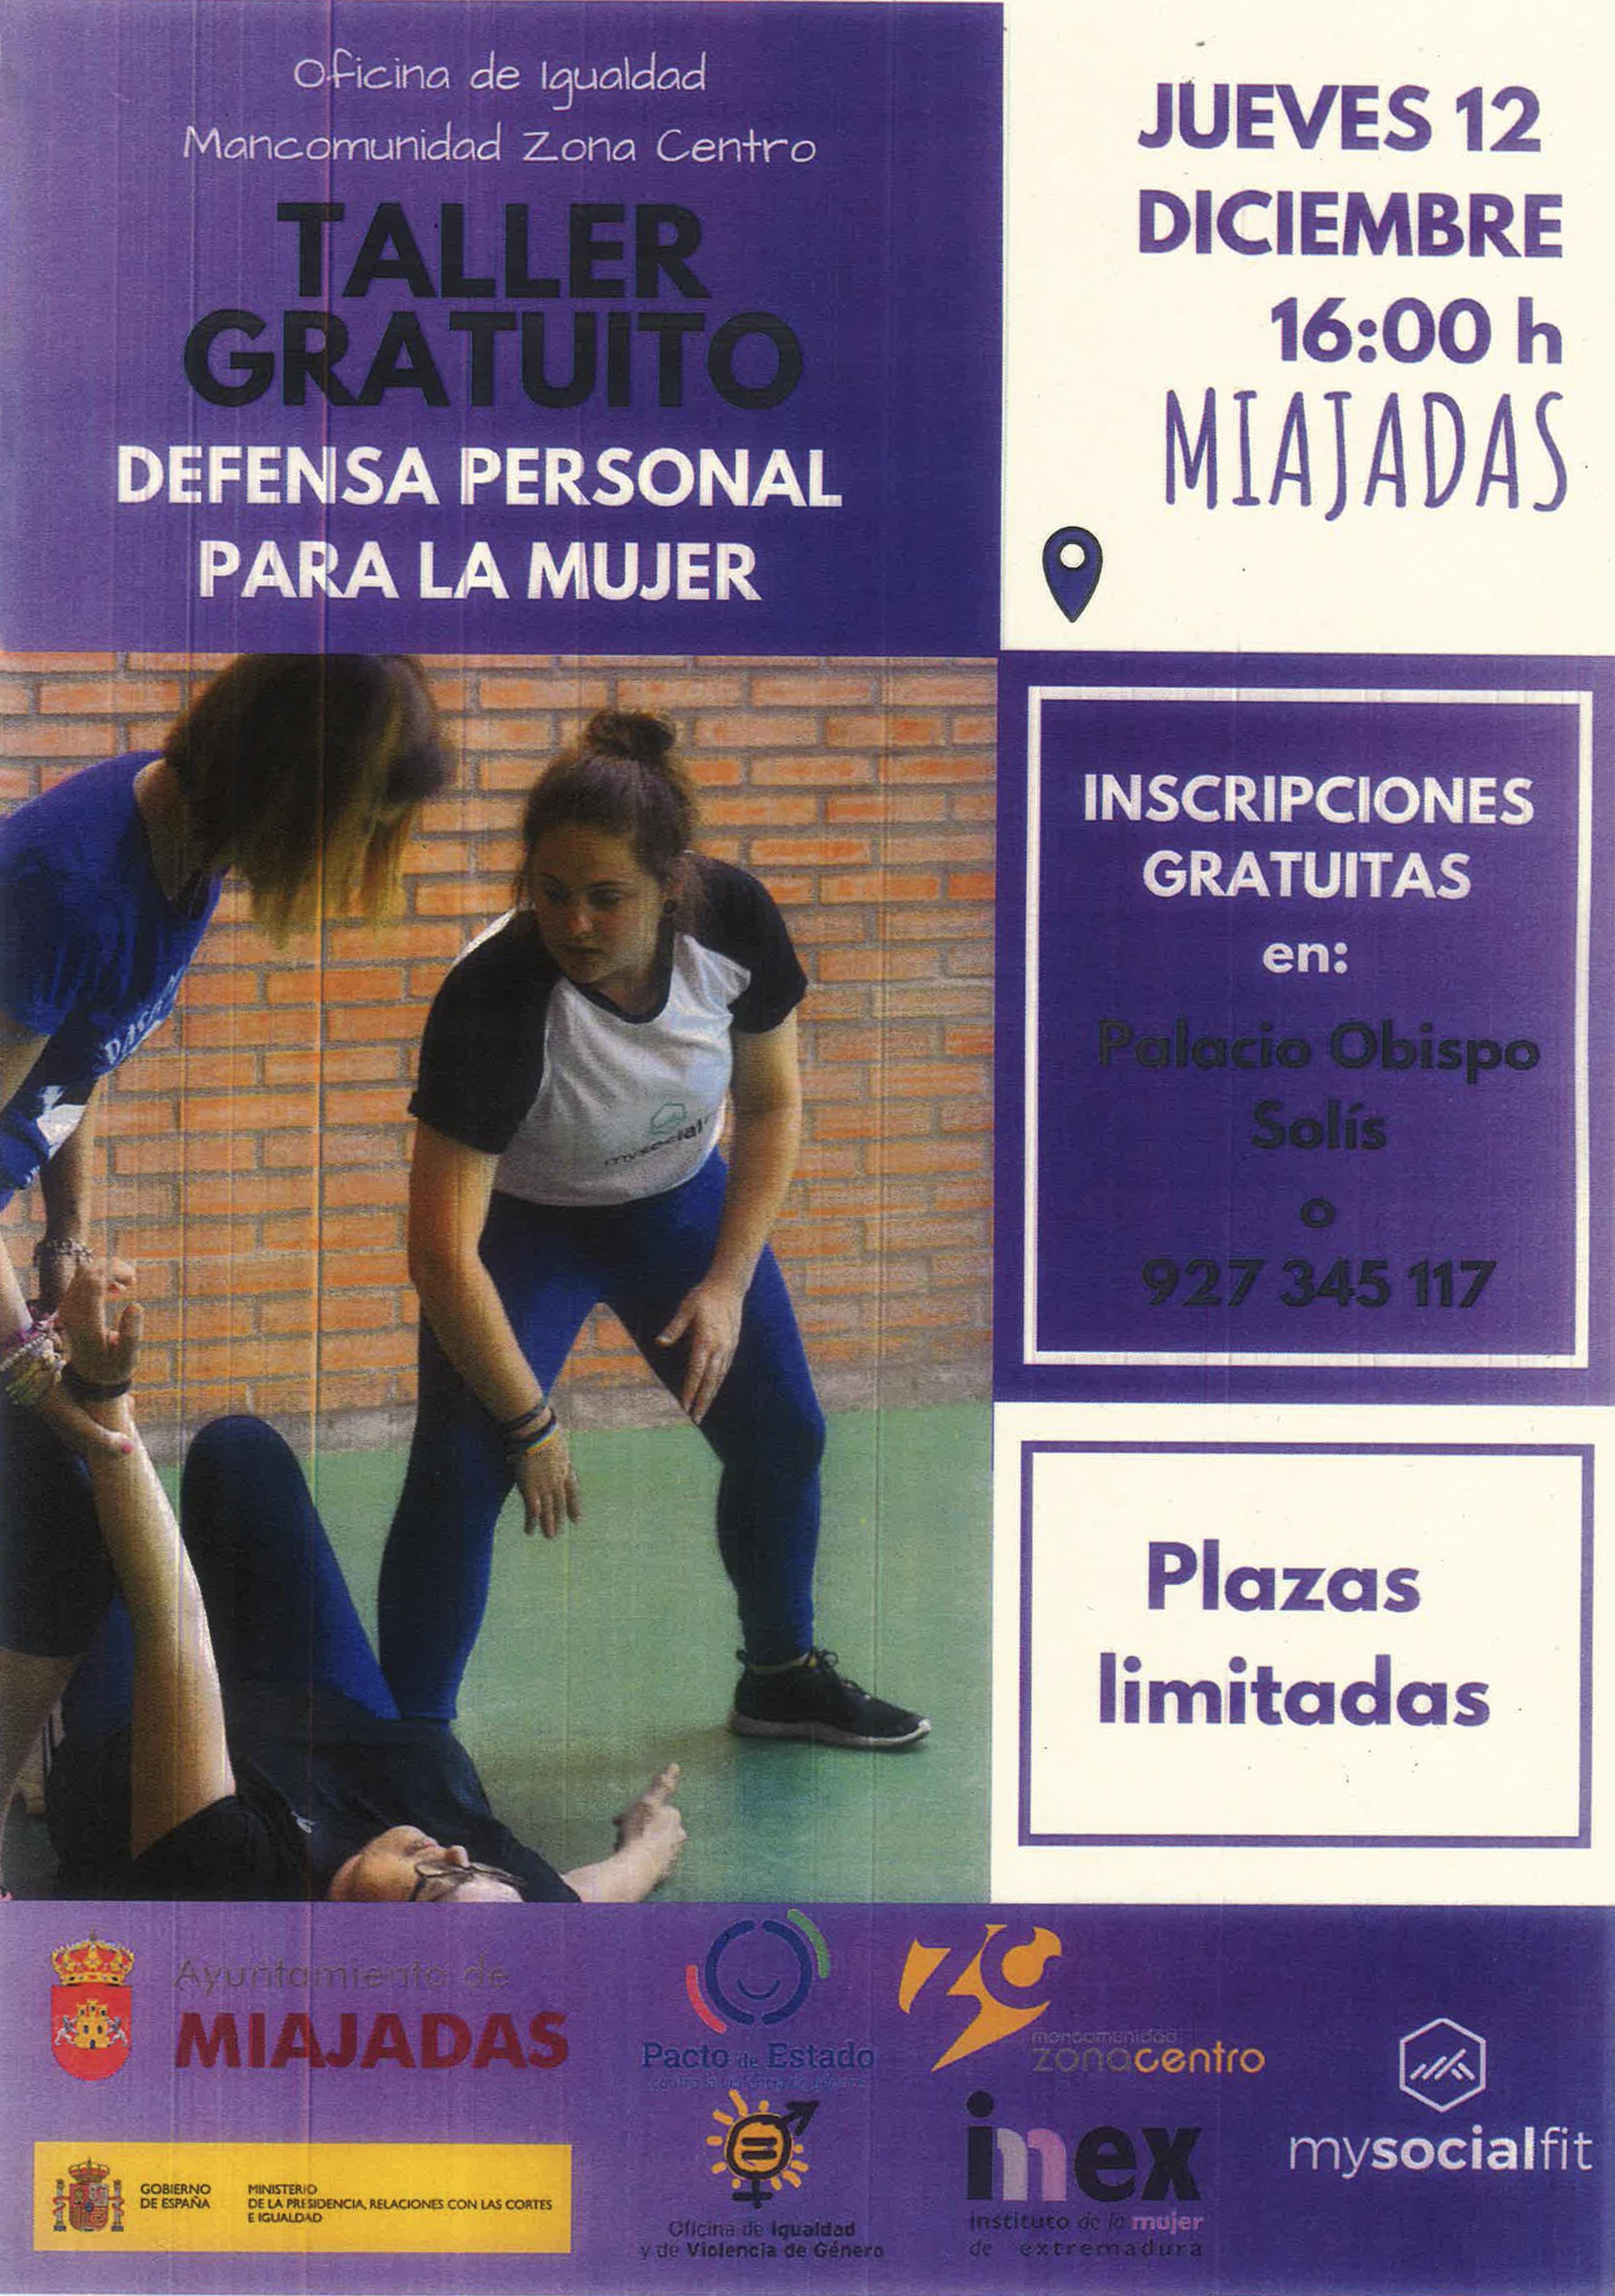 25n19 defensa personal Miajadas